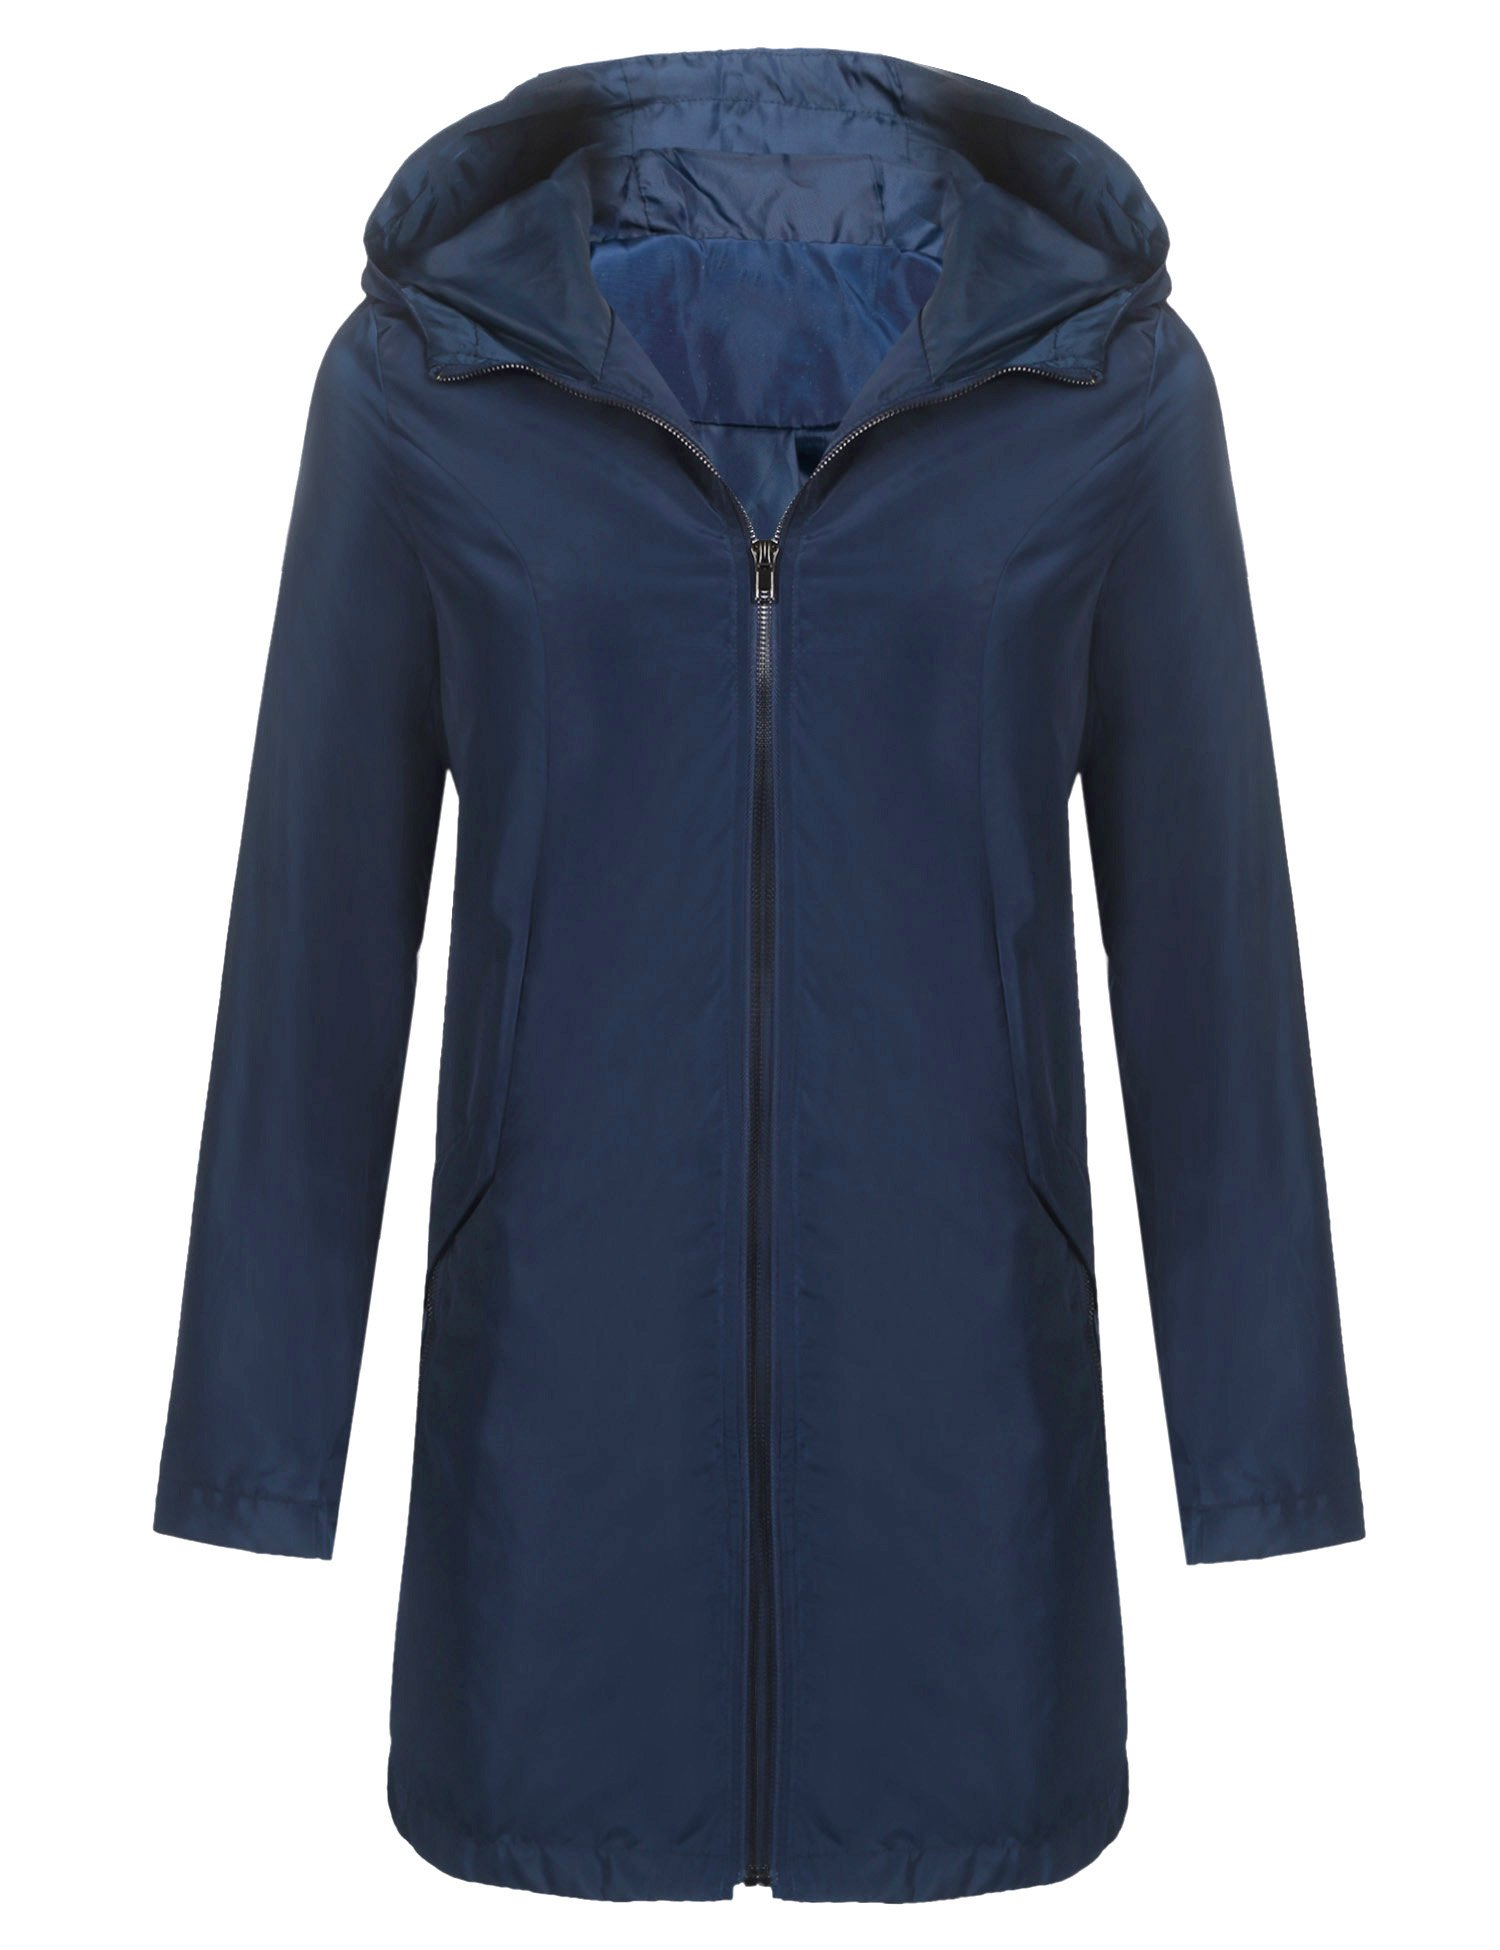 Zeagoo Womens Travel Trench Waterproof Raincoat Hoodie Windproof Hiking Packable Jacket Dark Blue XXL